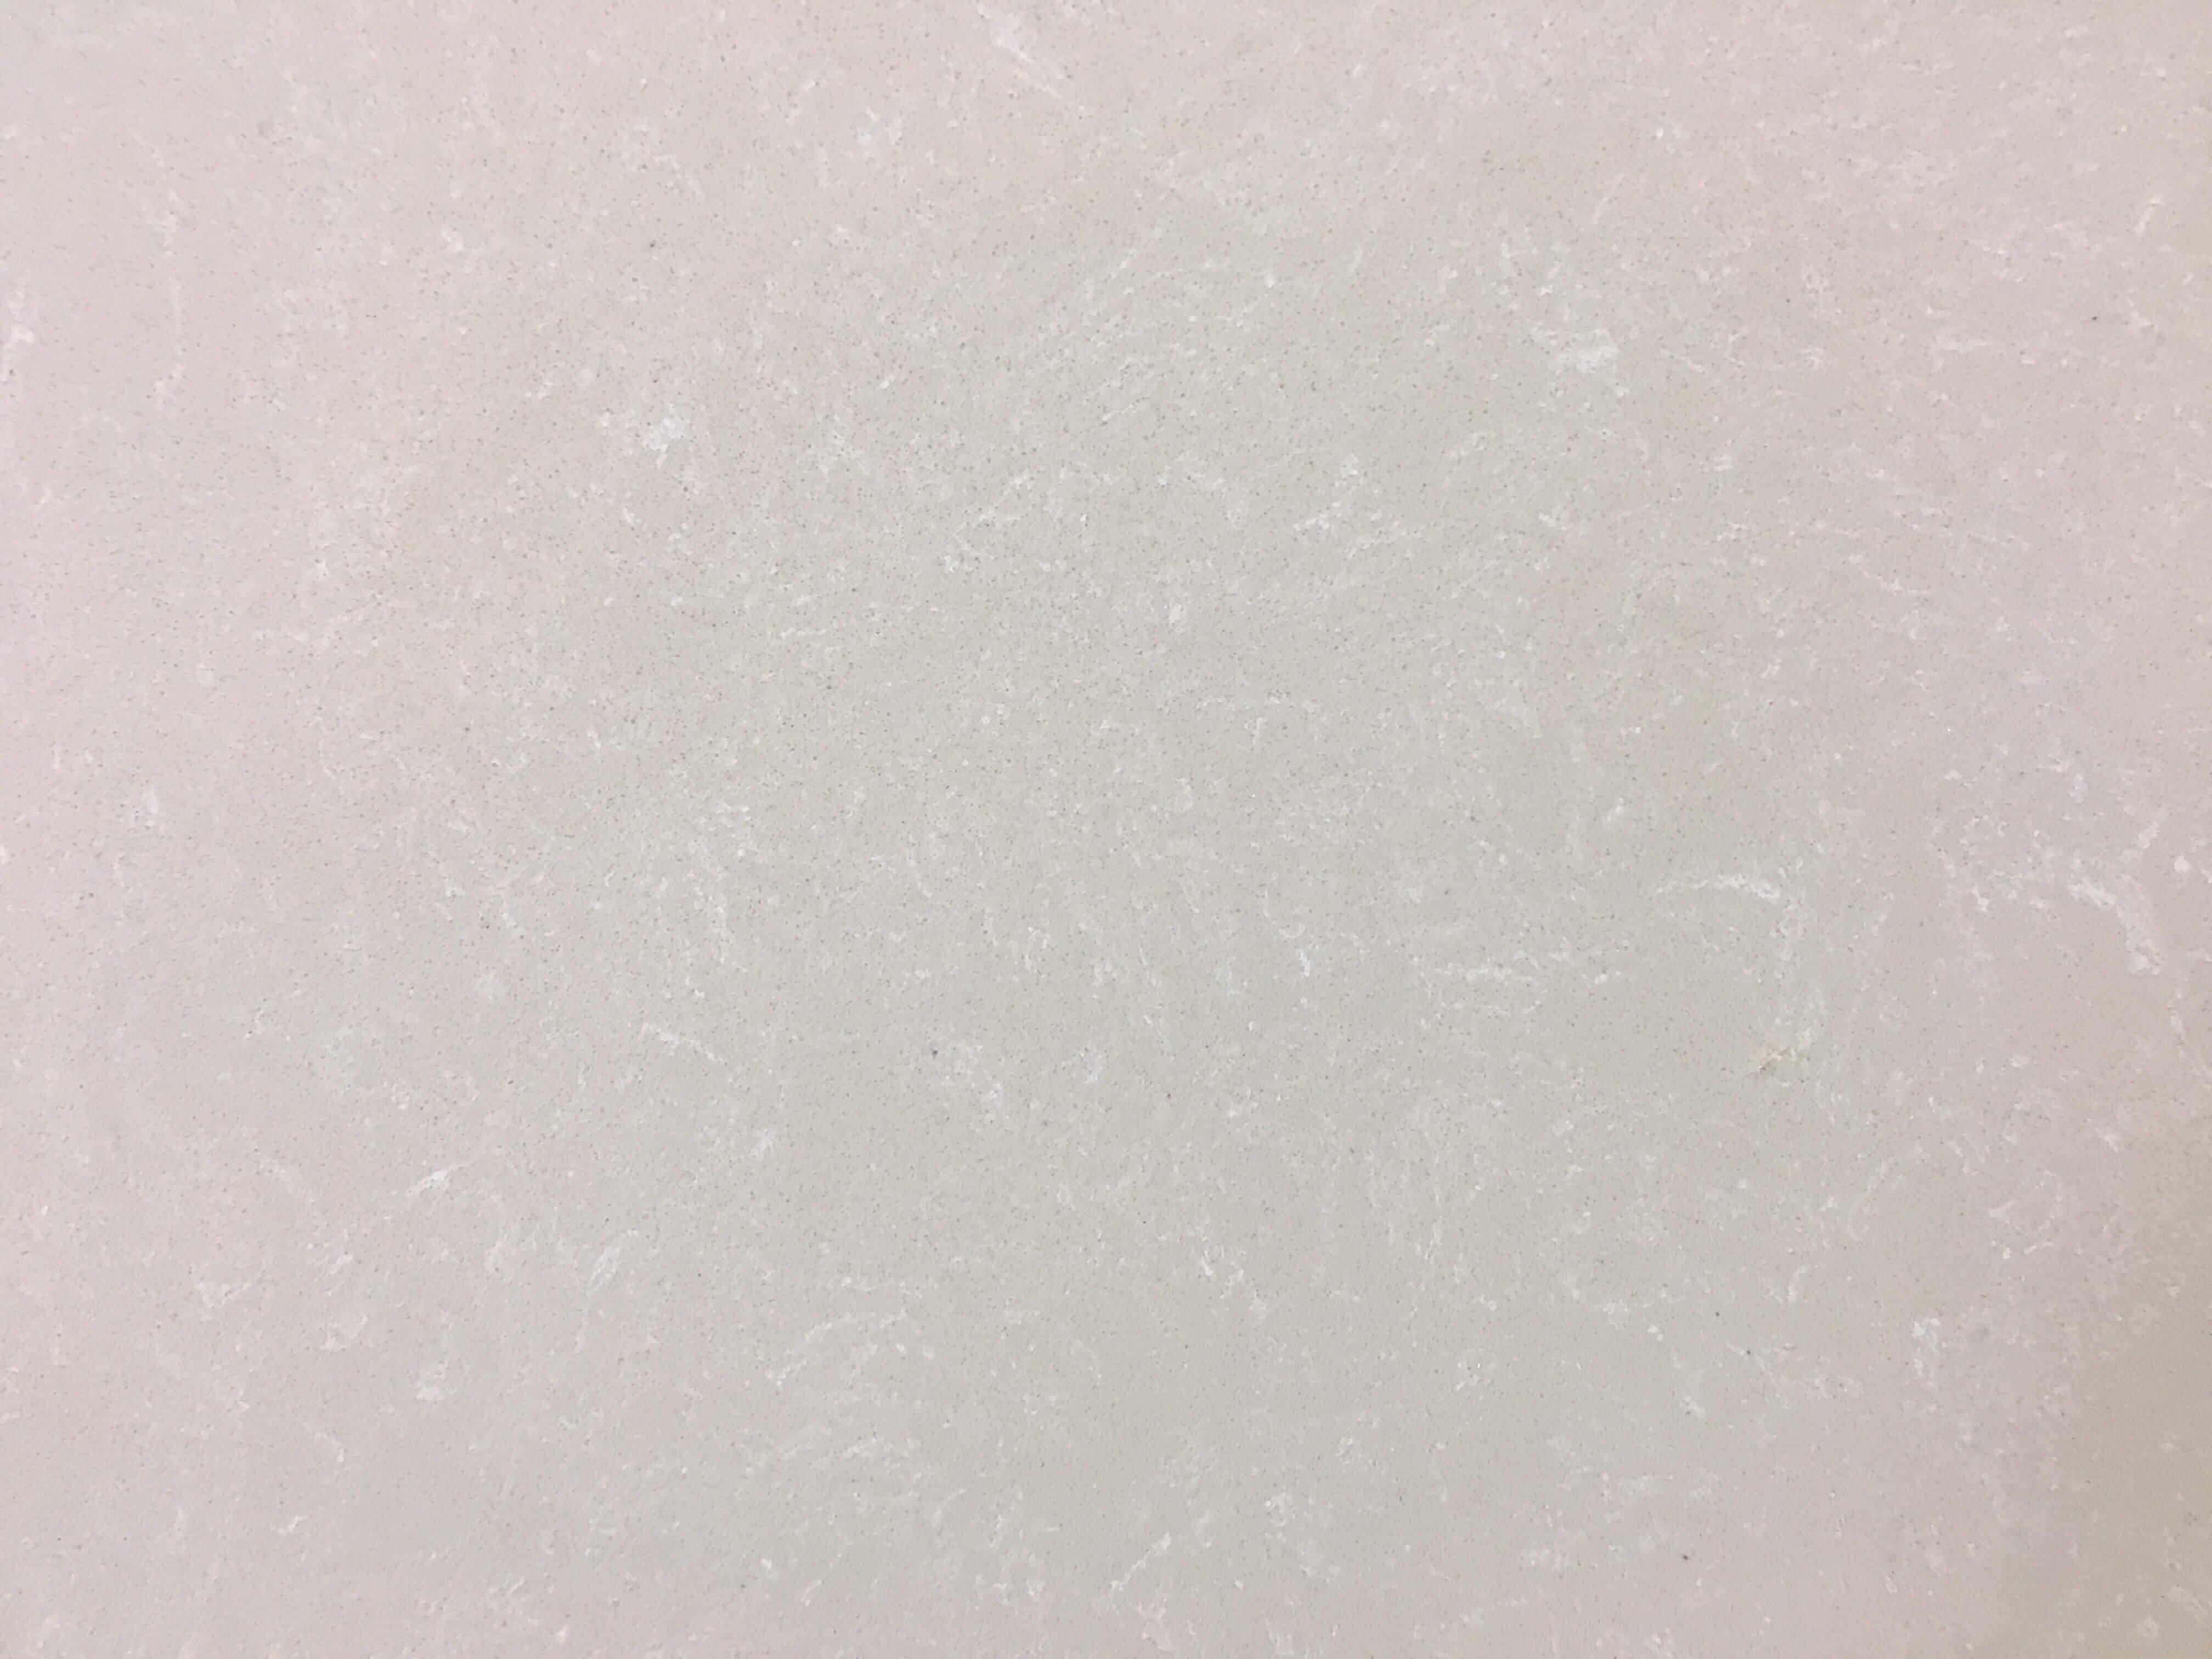 Crema Light close-up